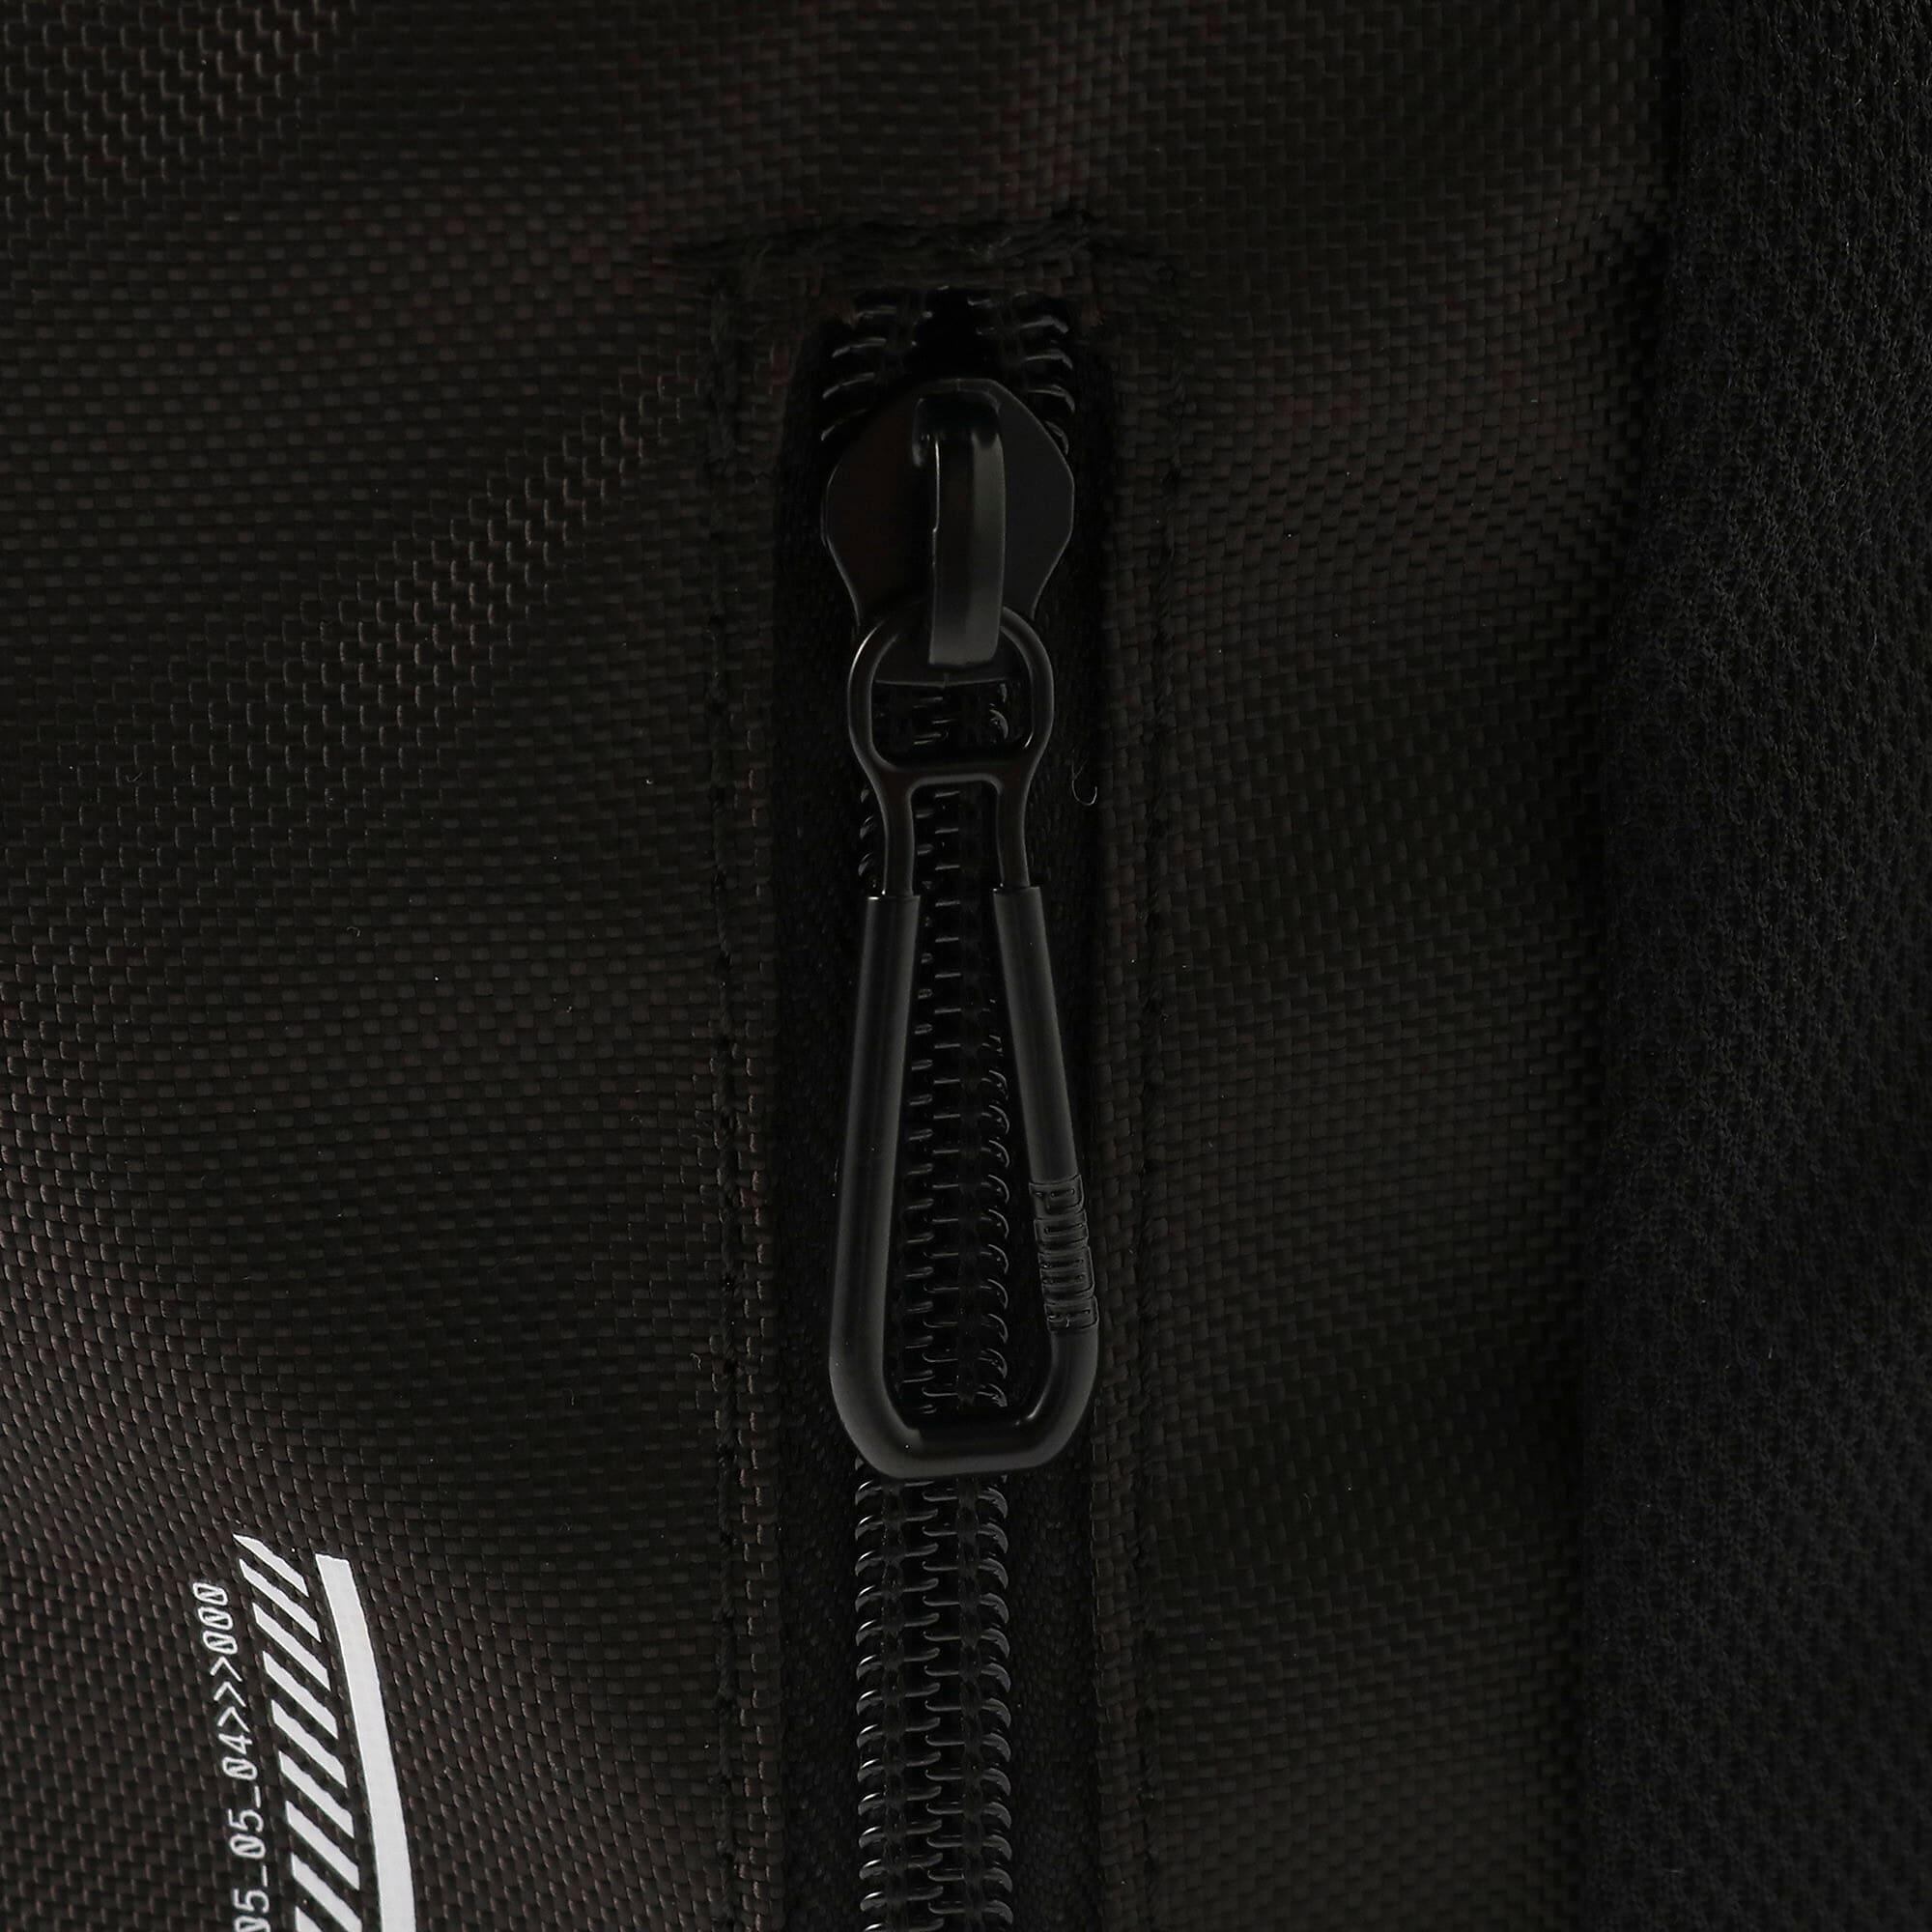 Thumbnail 7 of エナジー ロールトップ バックパック 18L, Puma Black, medium-JPN